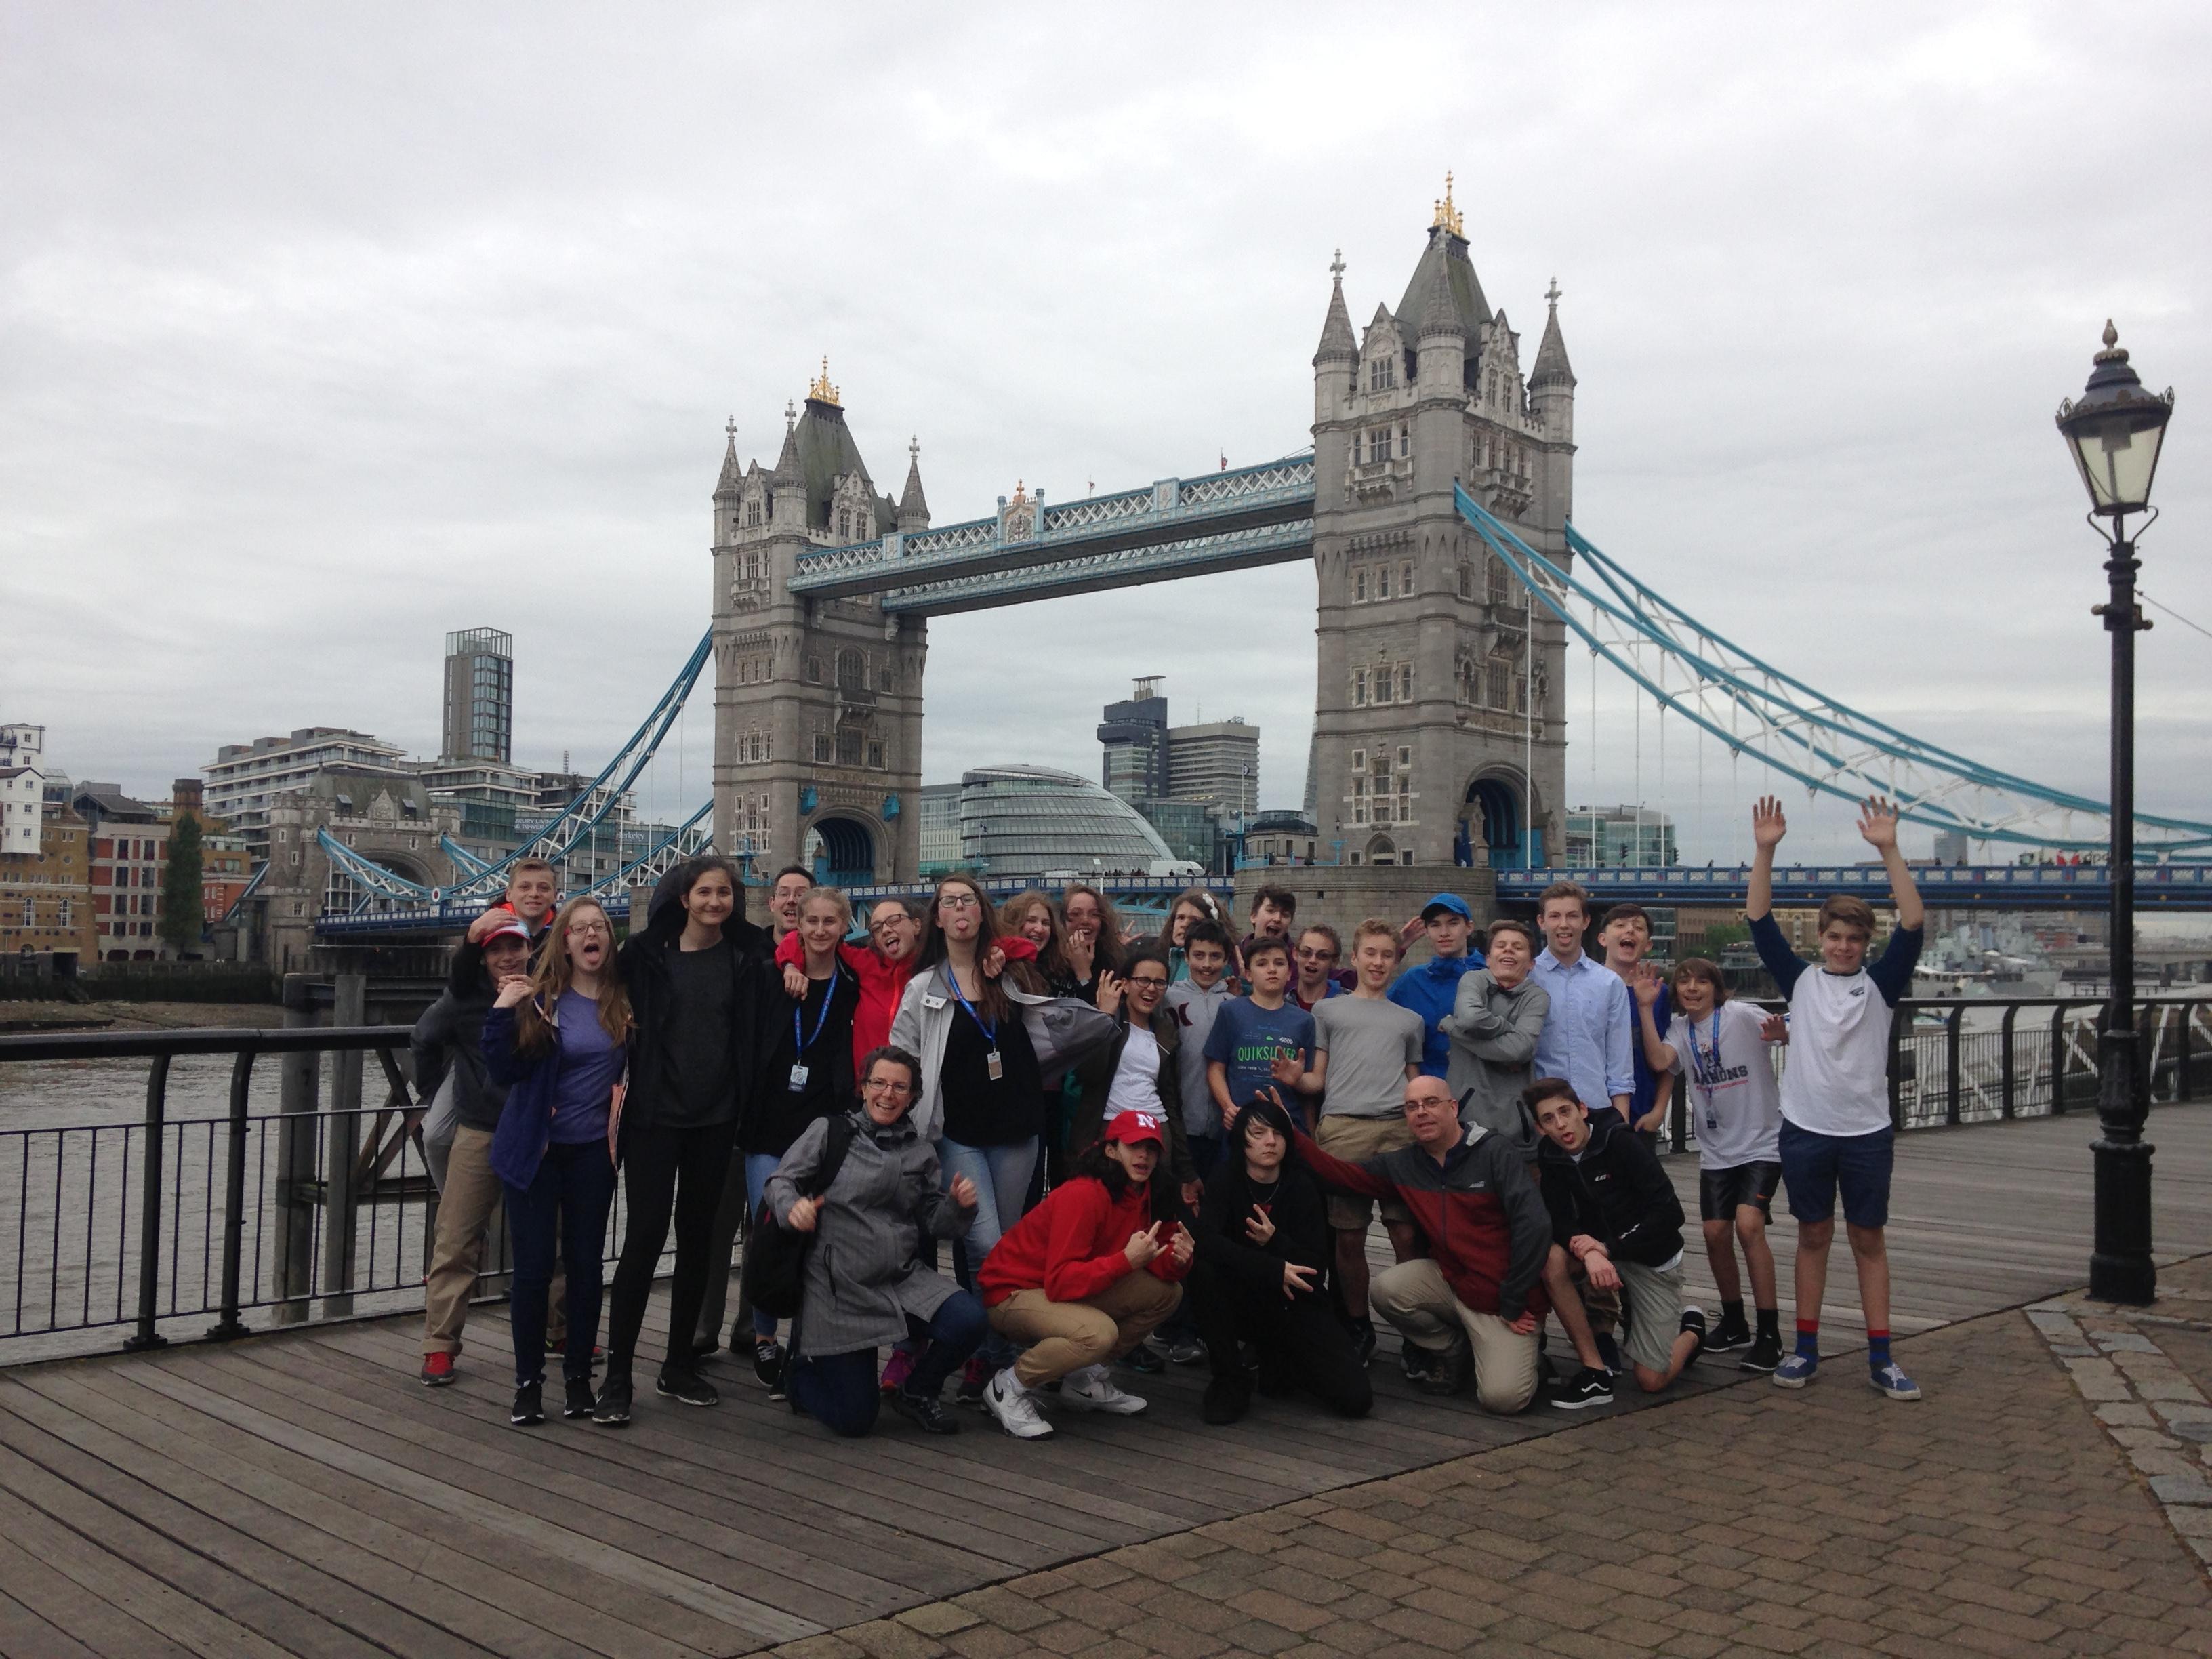 UK_London_Youth_Tower Bridge